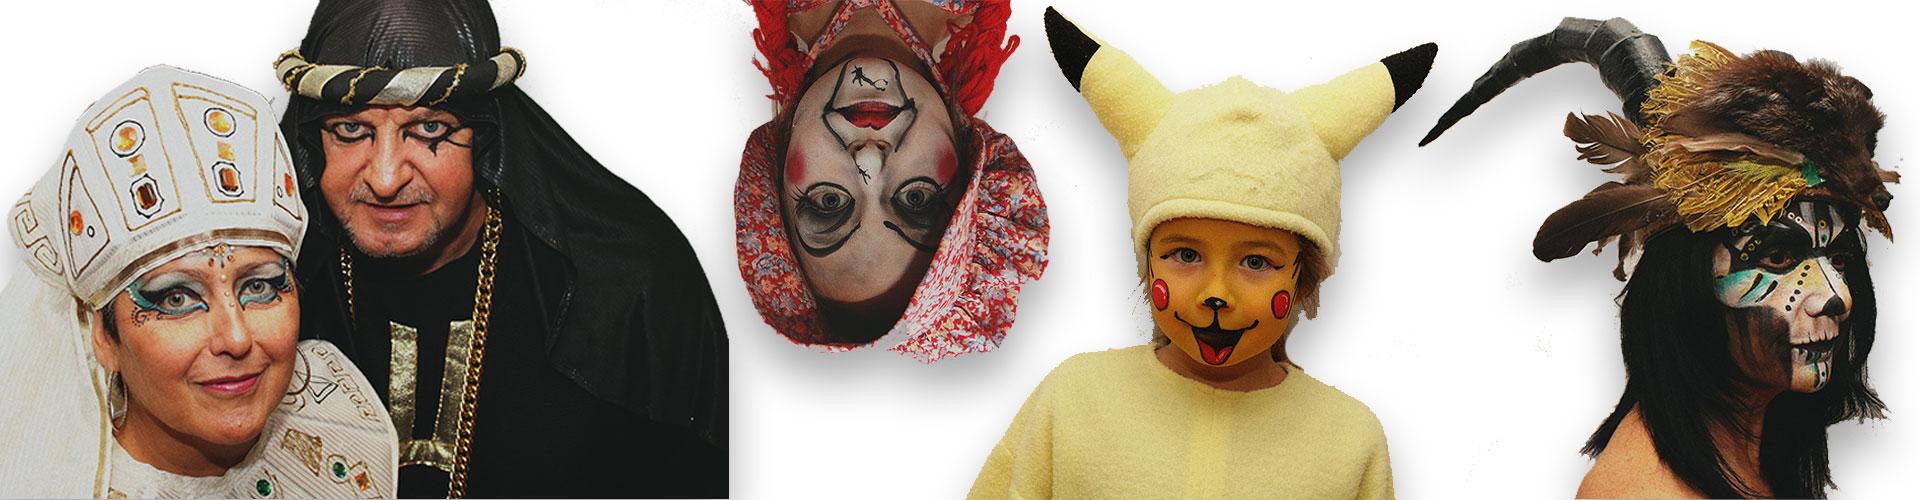 location-de-costume-halloween-saguenay-lac-saint-jean